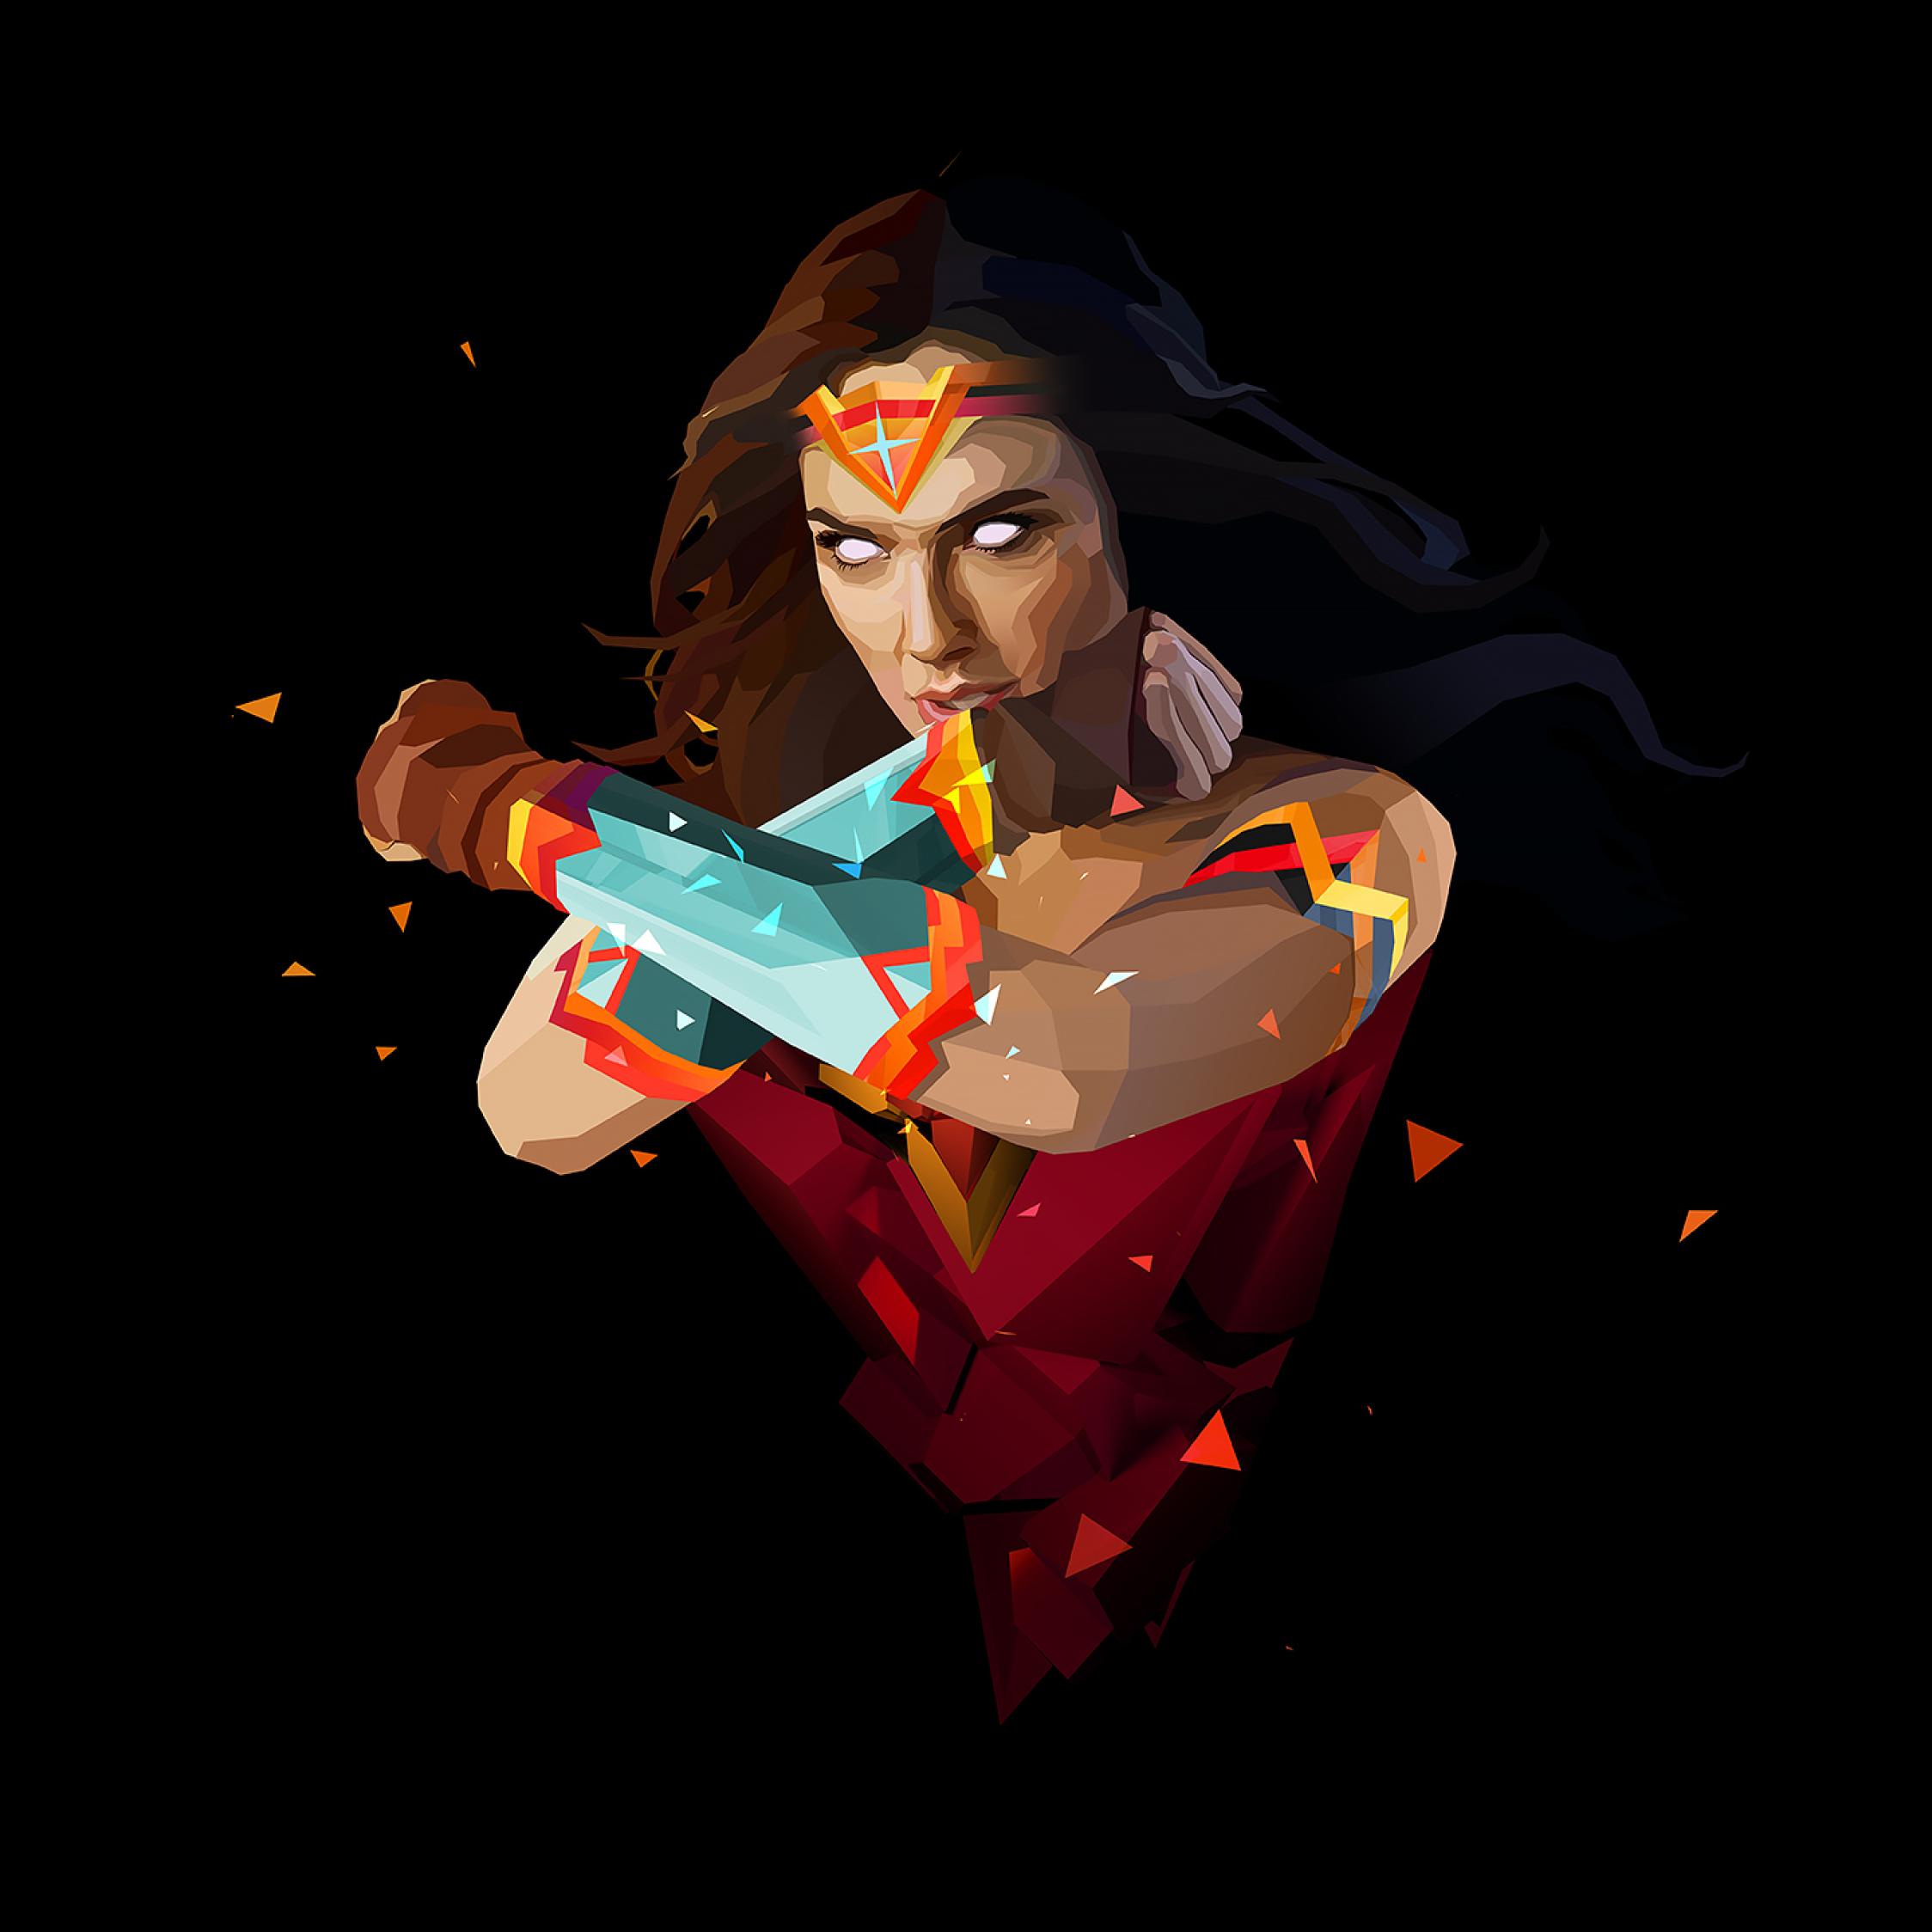 Wonder Woman Paint Art, Full HD 2K Wallpaper